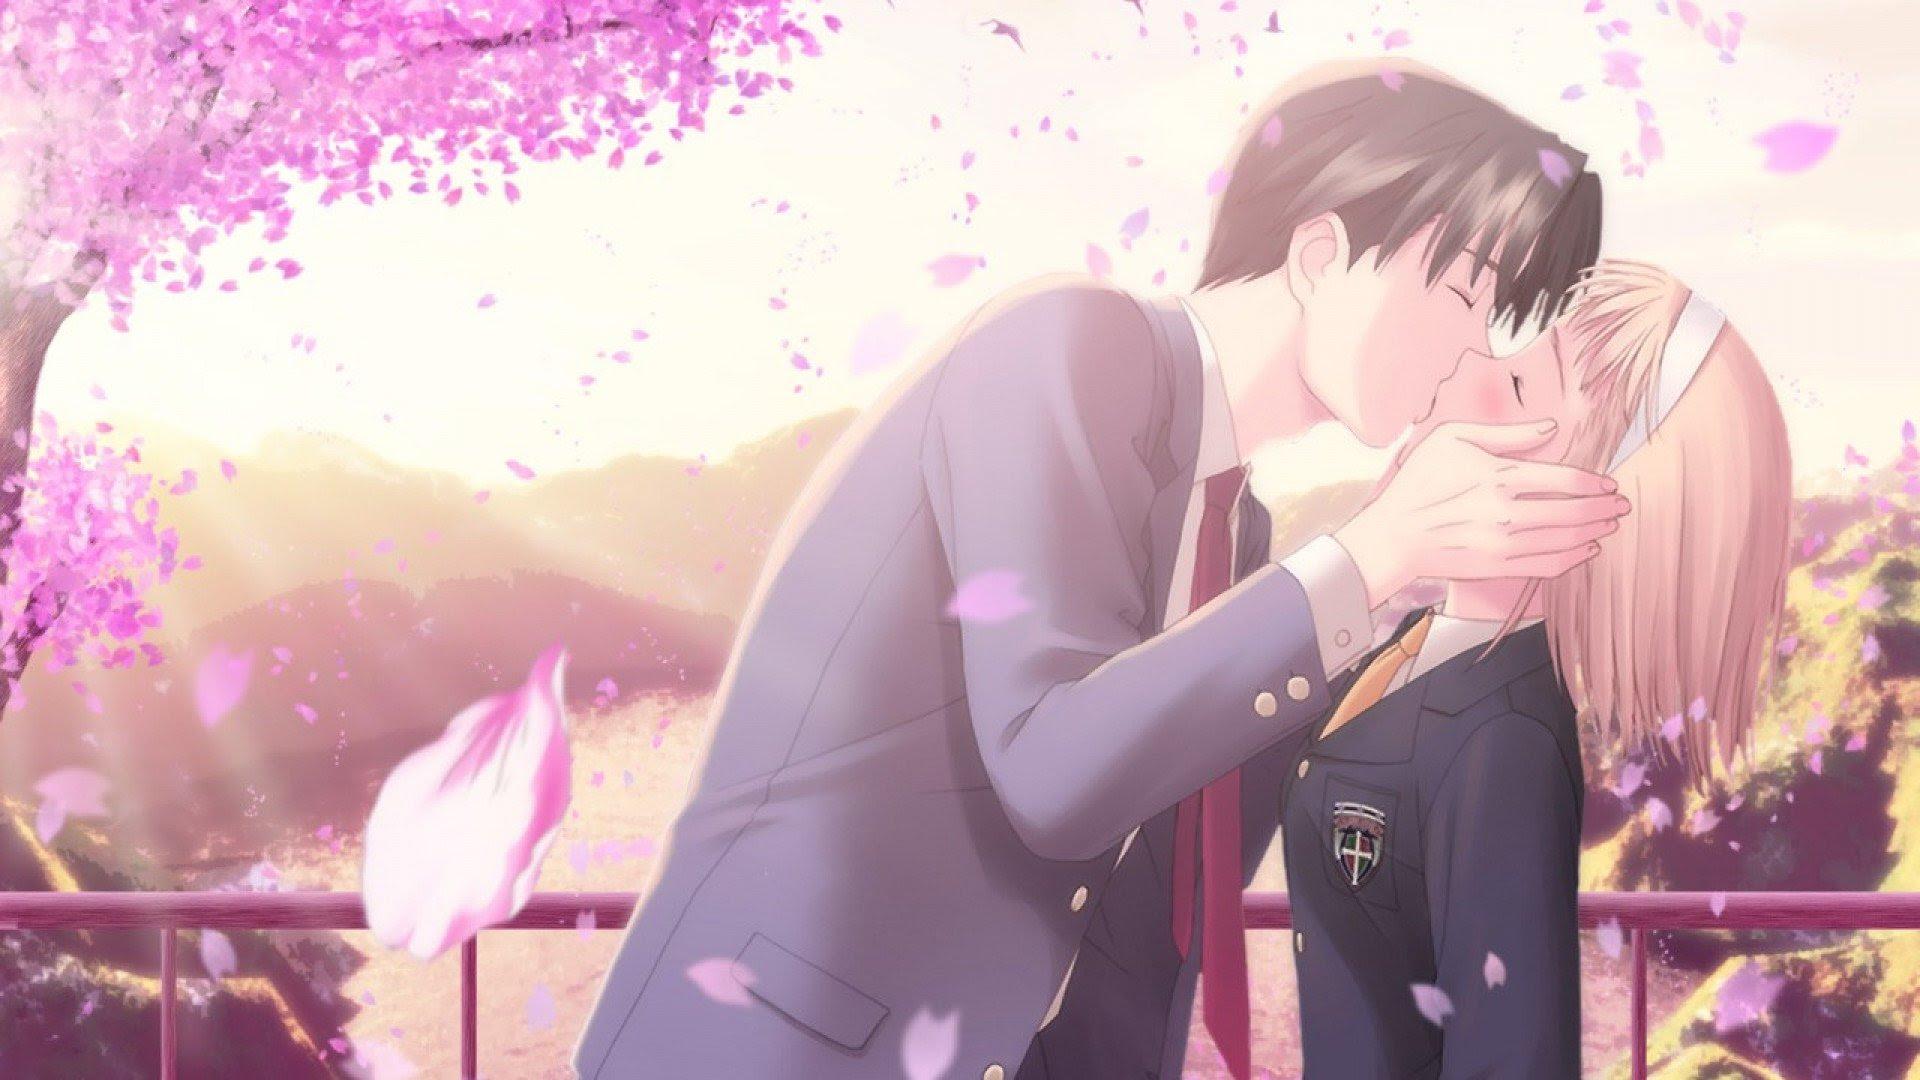 HD Cute Anime Couple Backgrounds | PixelsTalk.Net